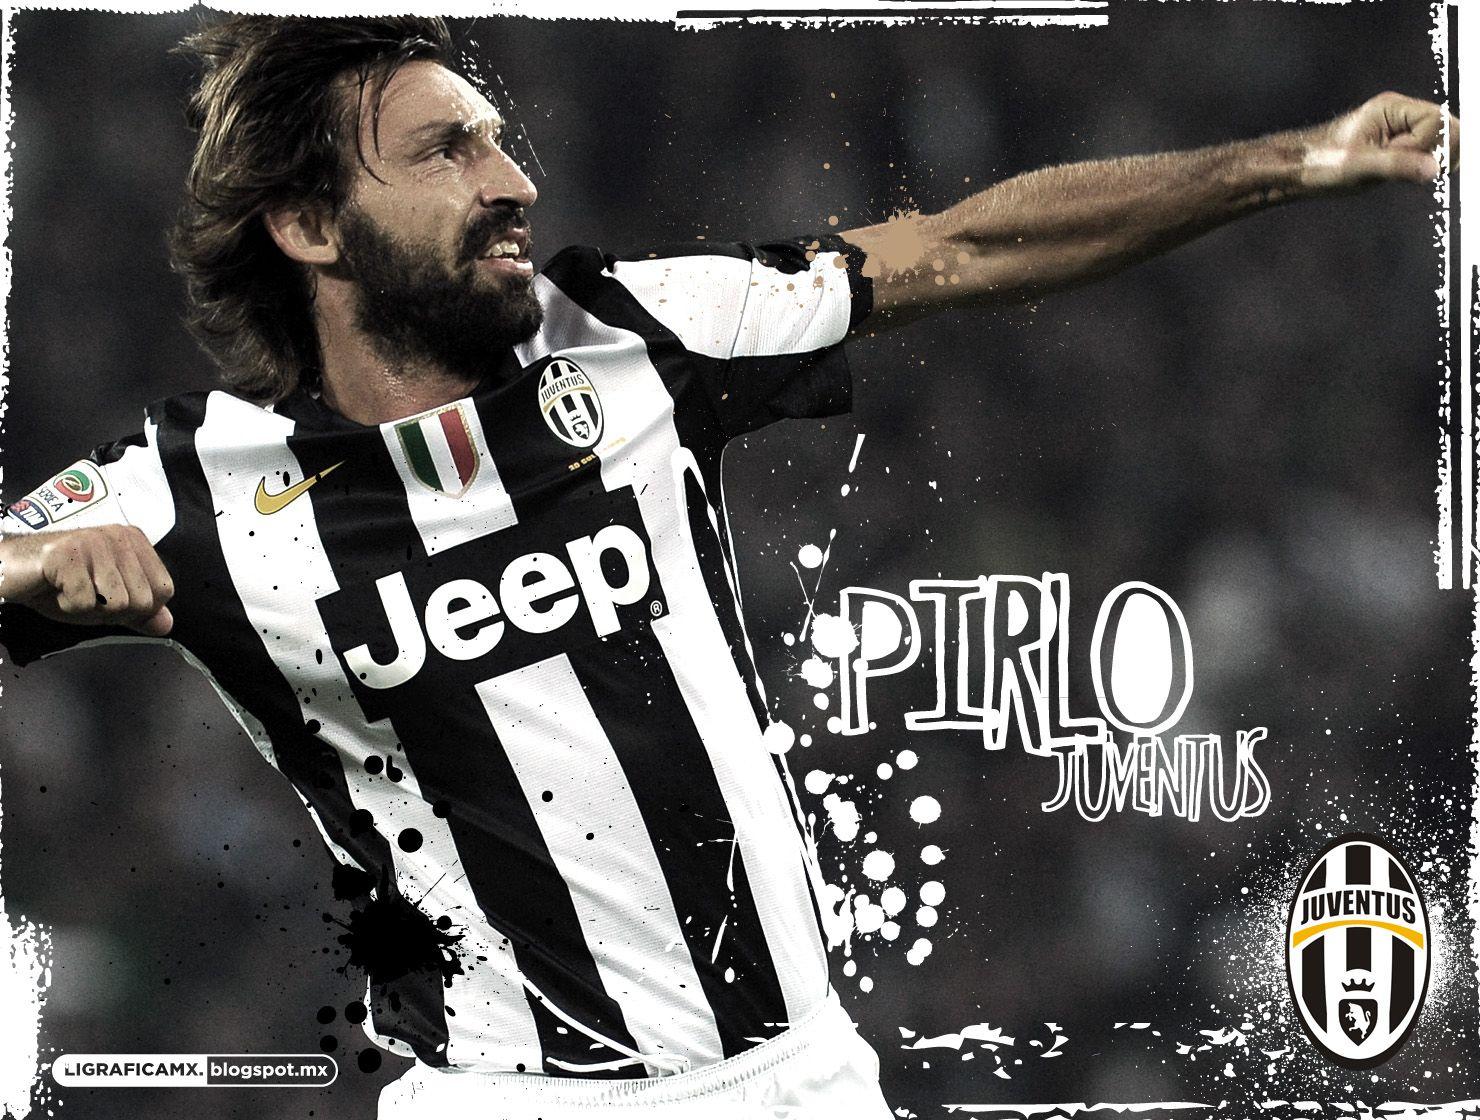 AndreaPirlo #Juventus #Wallpaper #LigraficaMX #ElFutbolNosInspira ...